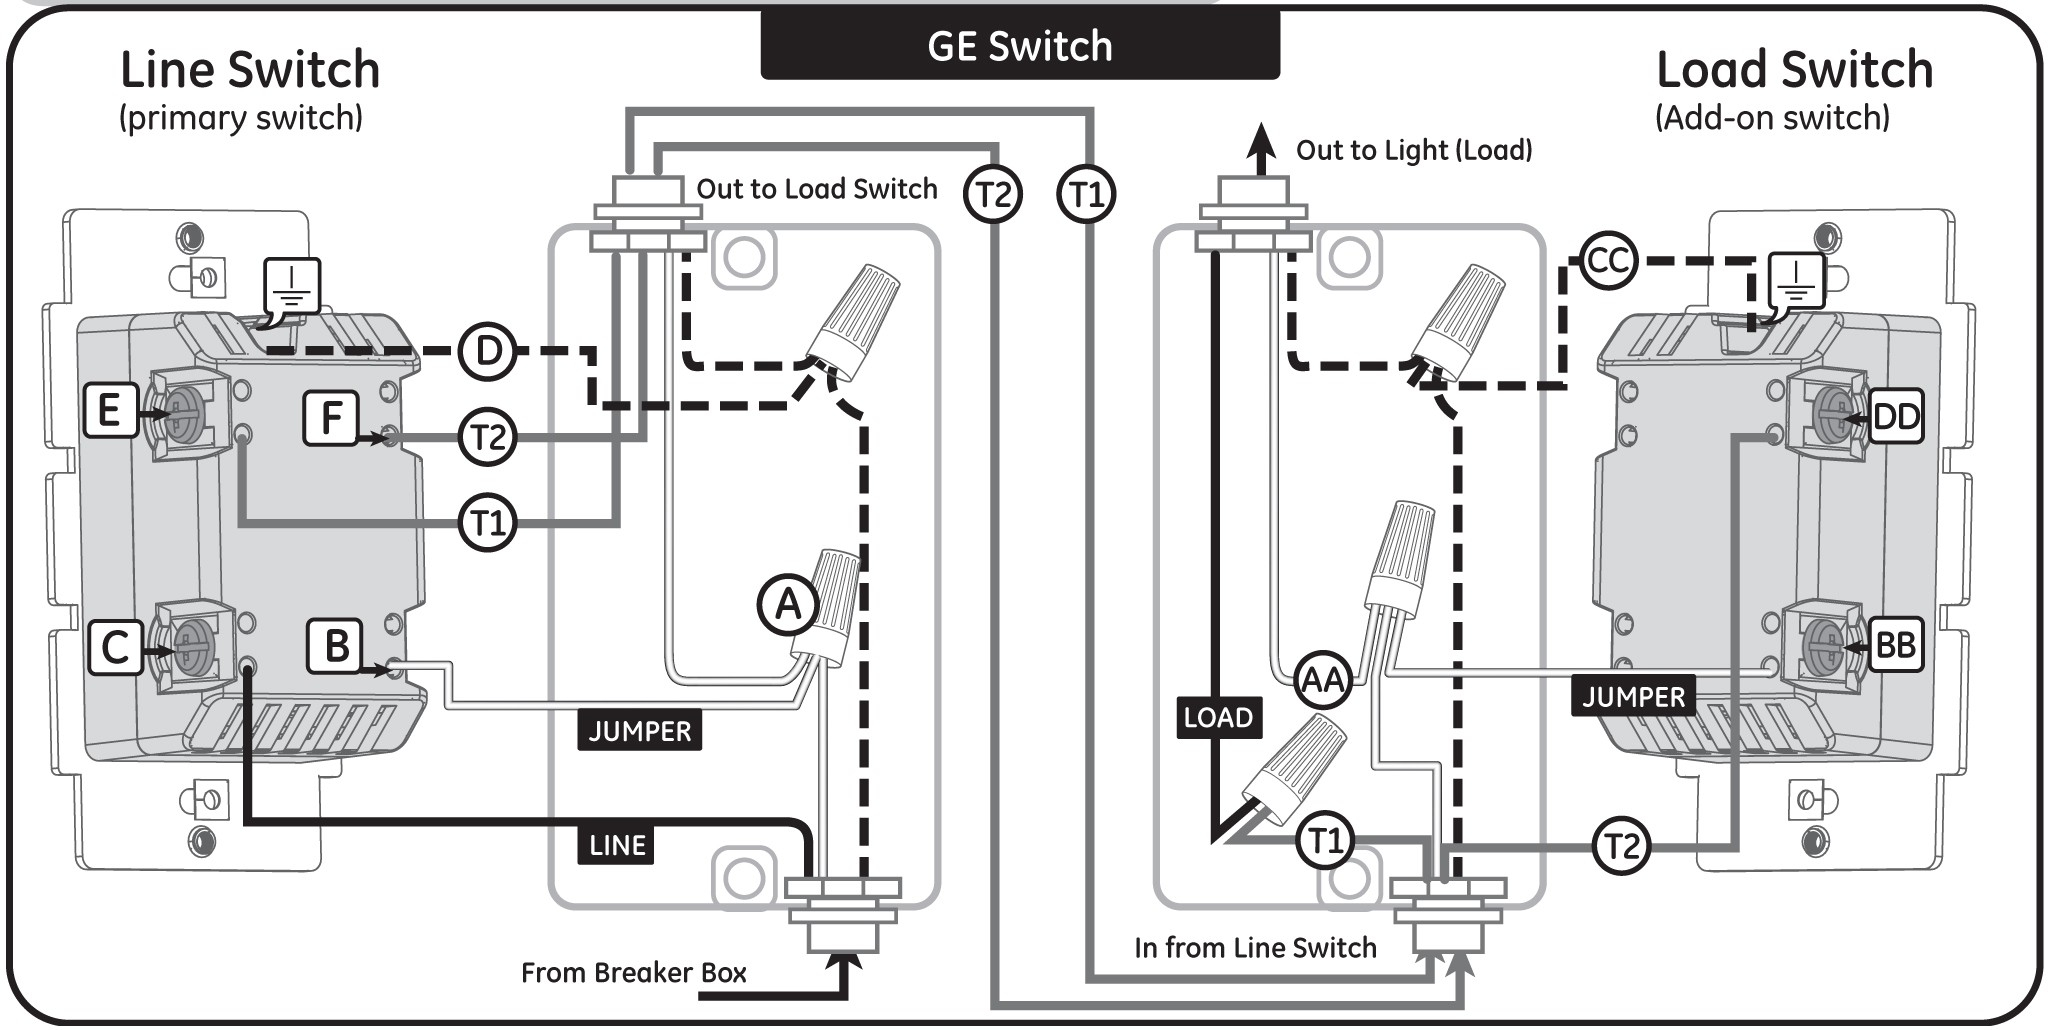 Ge 3 Way Dimmer Switch Wiring Diagram - Wiring Diagram  Way Switch Wiring Diagram Safety on